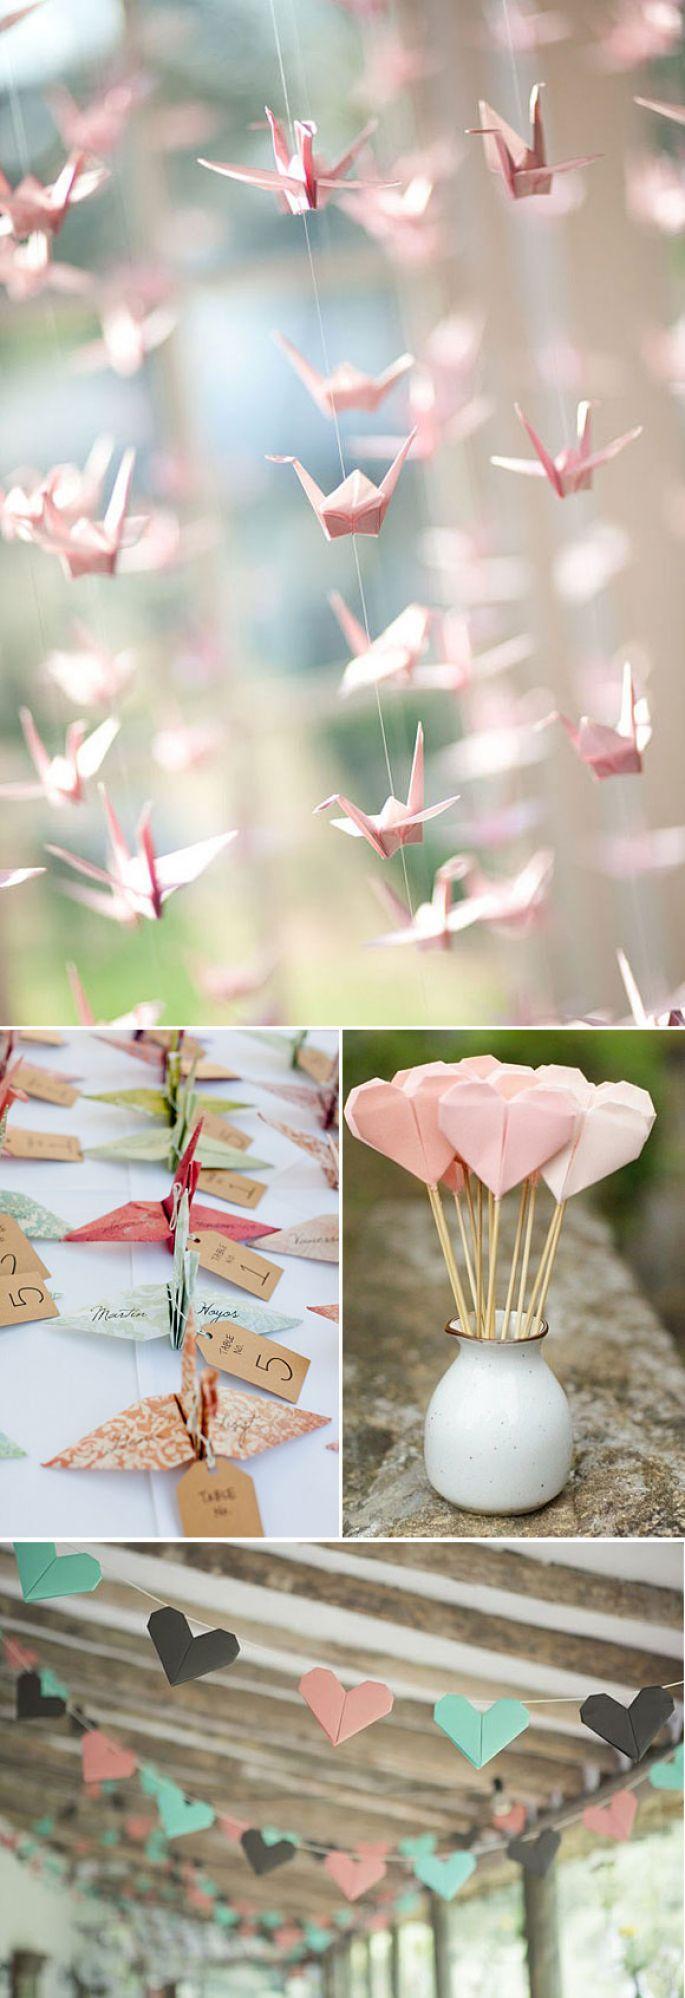 decoracion-bodas-con-origami